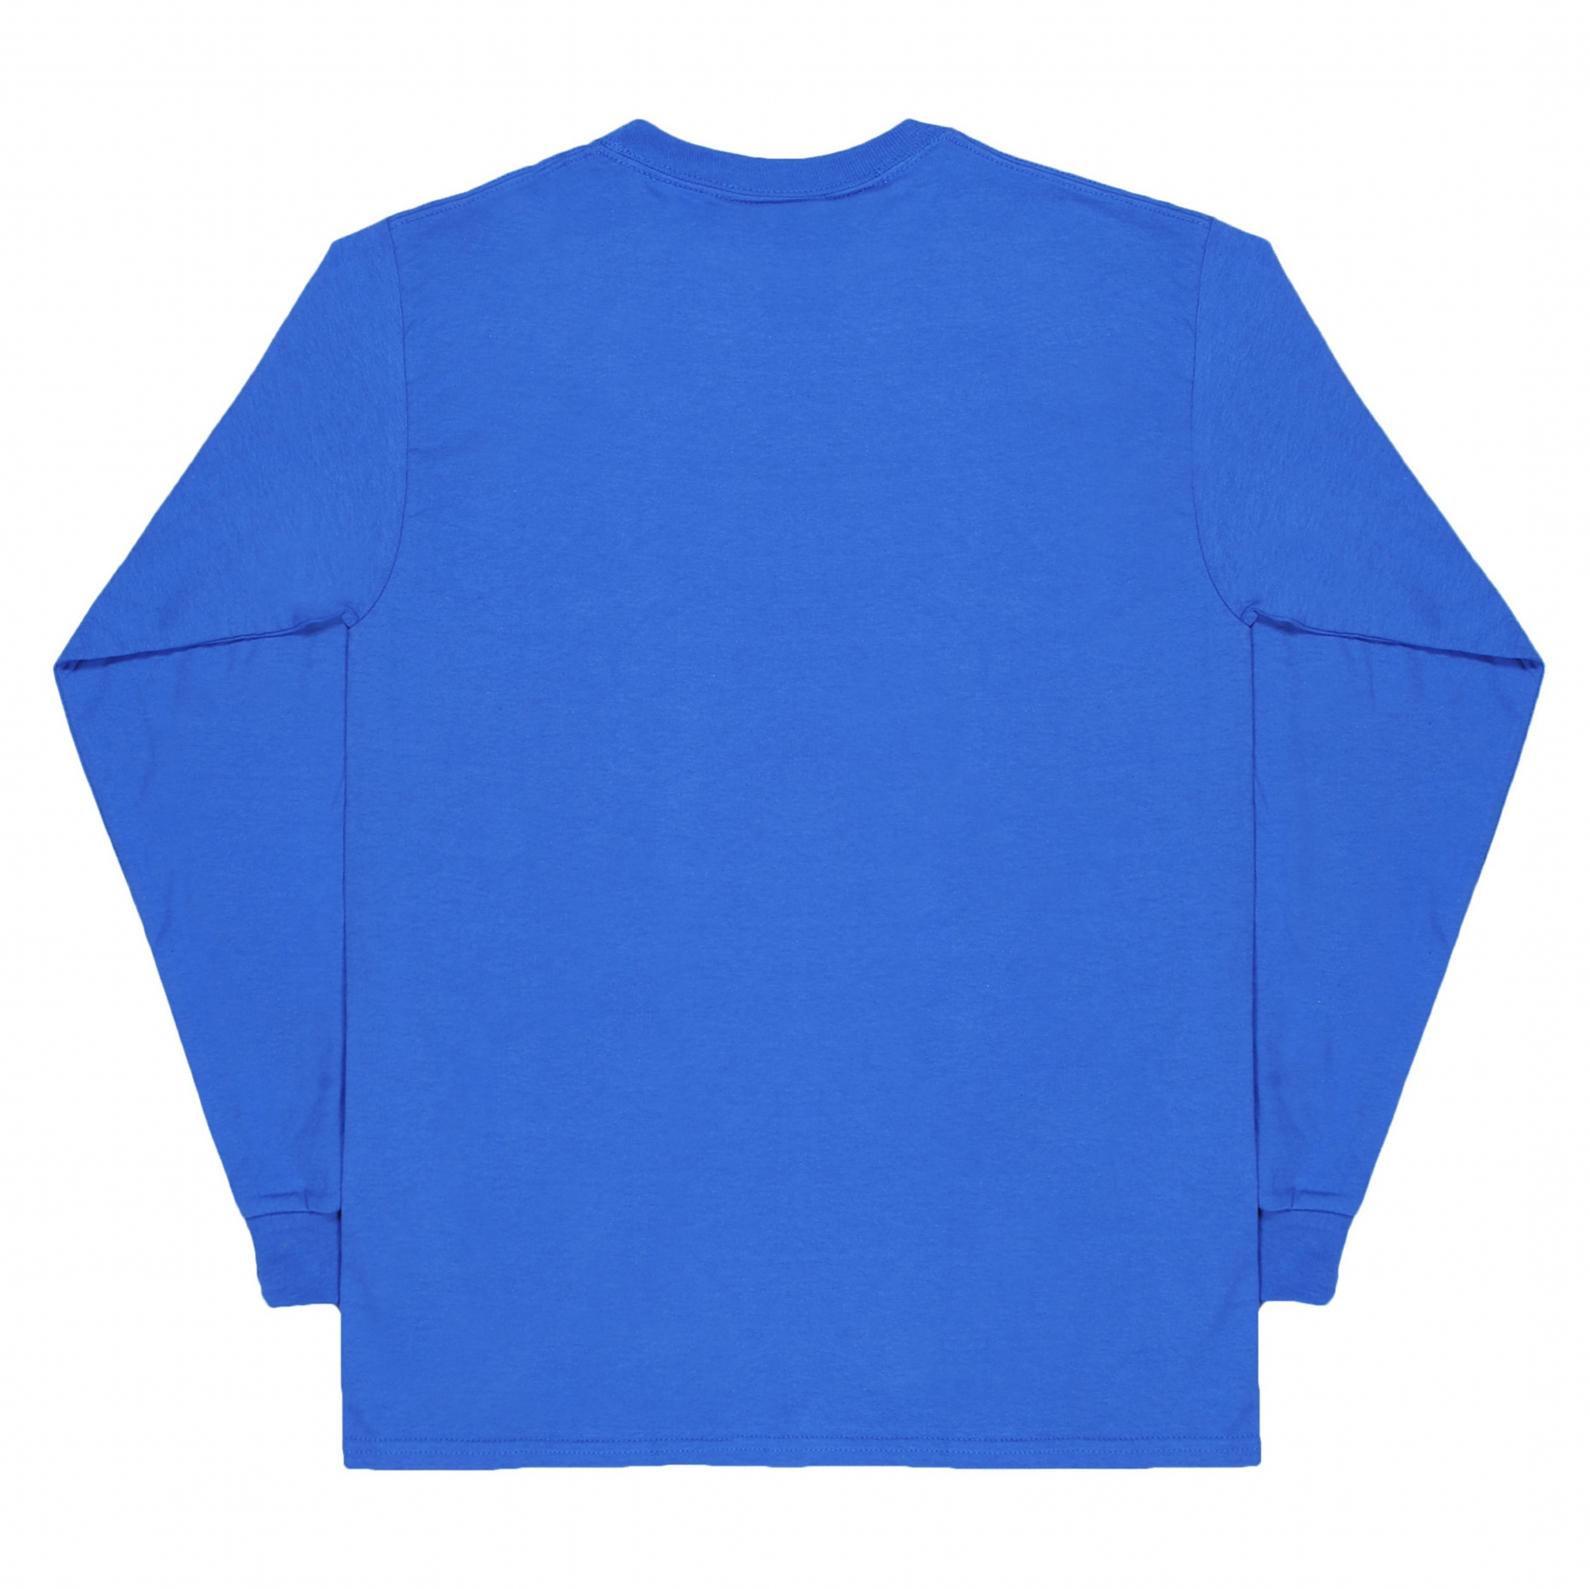 【RAVE SKATEBOARDS/レイブスケートボード】CAVENDOLI  ロングTシャツ / ROYAL BLUE